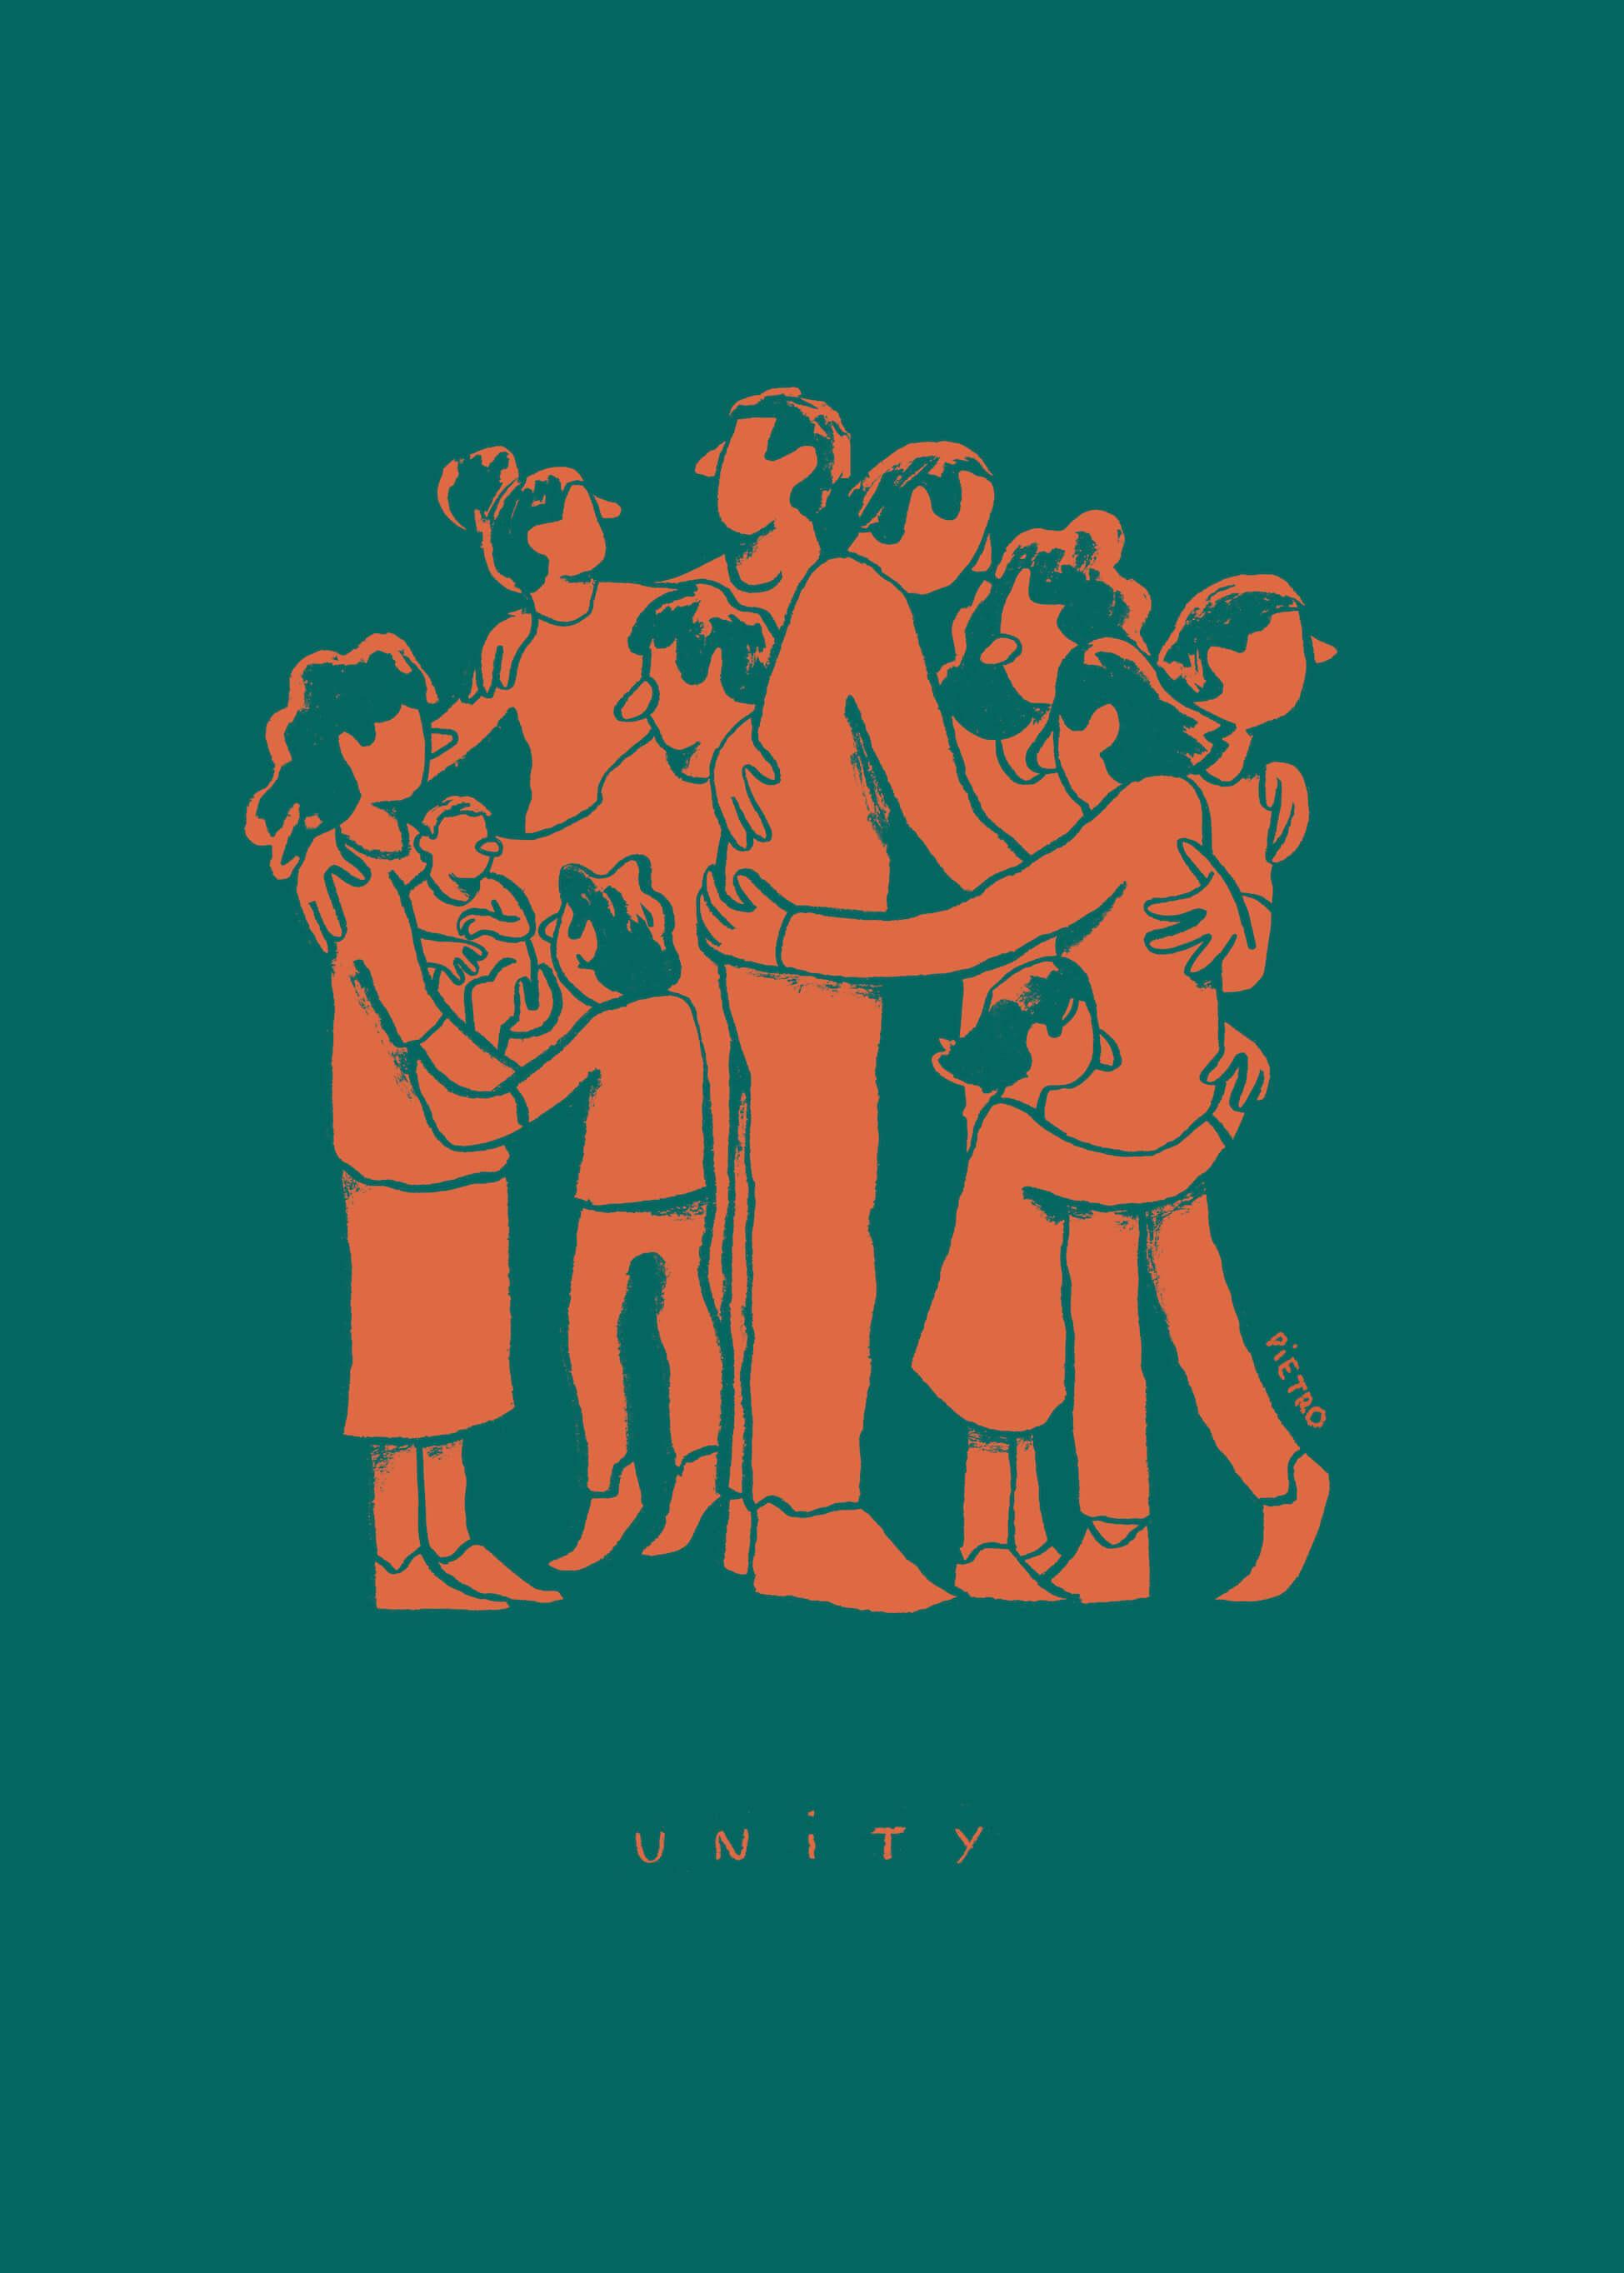 Unity (alternate version) main image